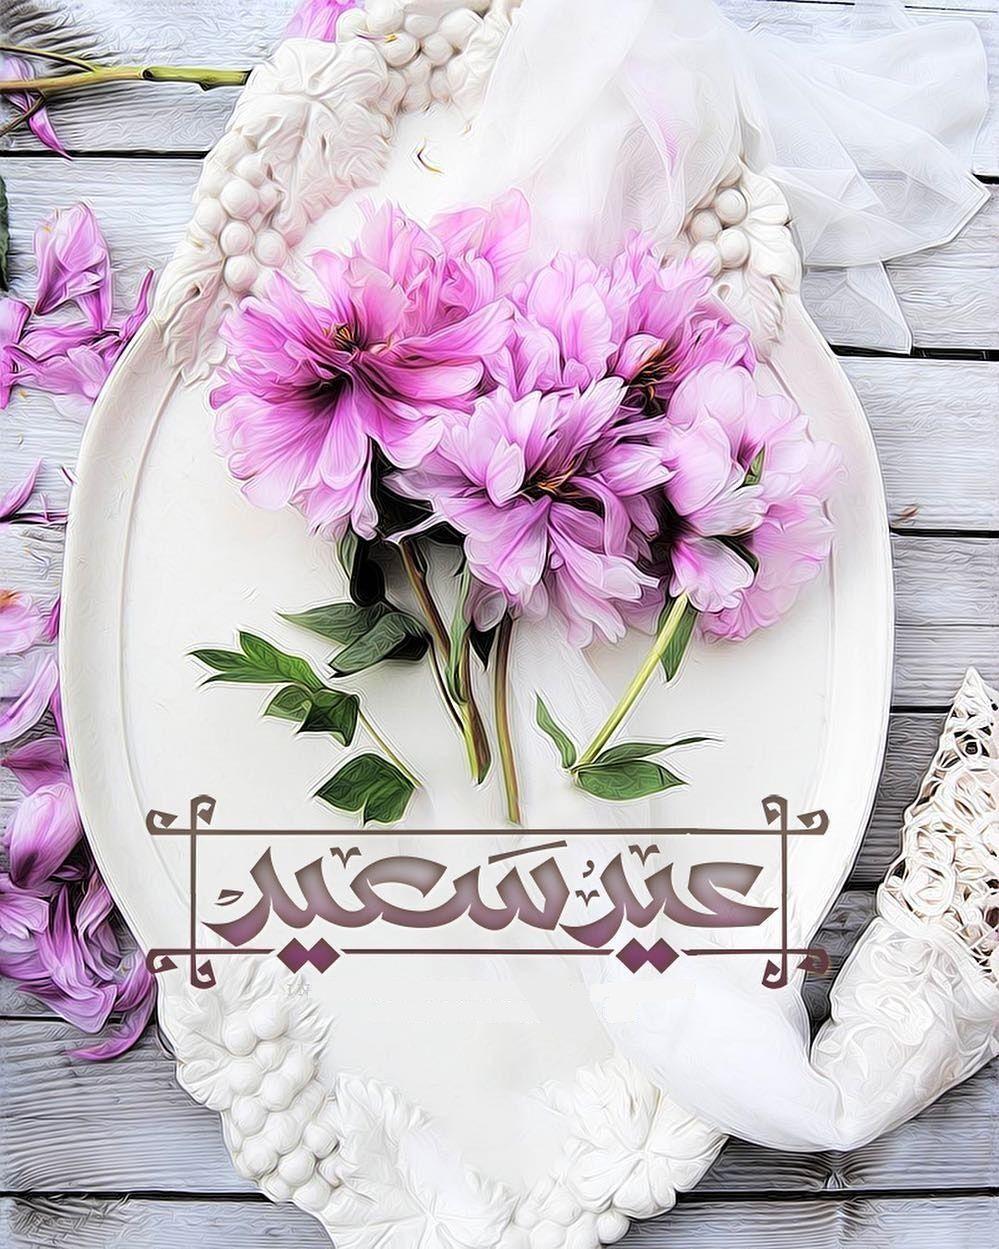 تهاني عيد الفطر 2019 Eid Images Eid Decoration Eid Cards